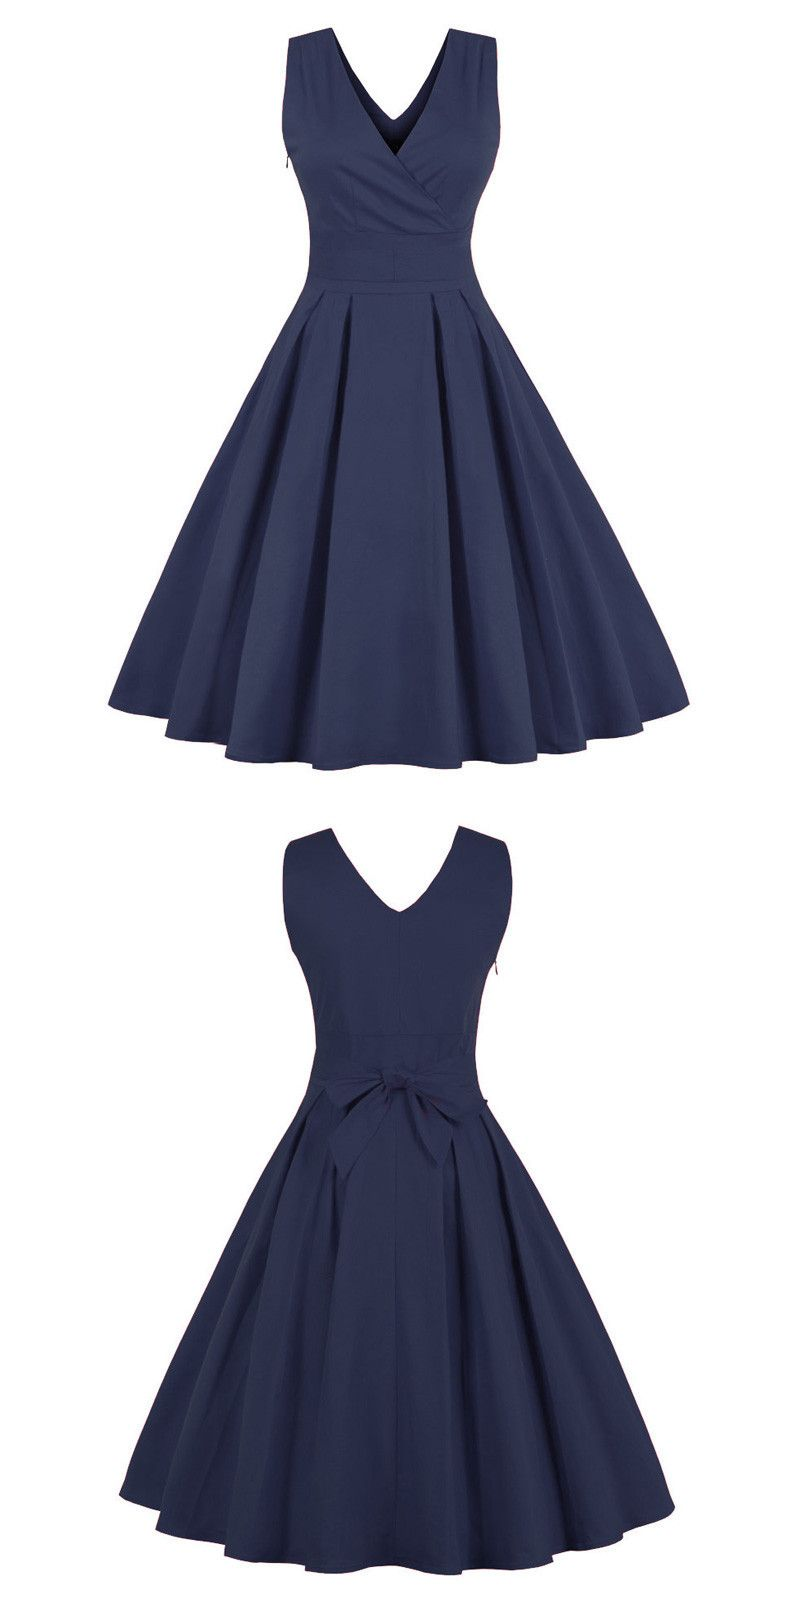 navy blue dress, short dress, 1950s vintage dress, party dress